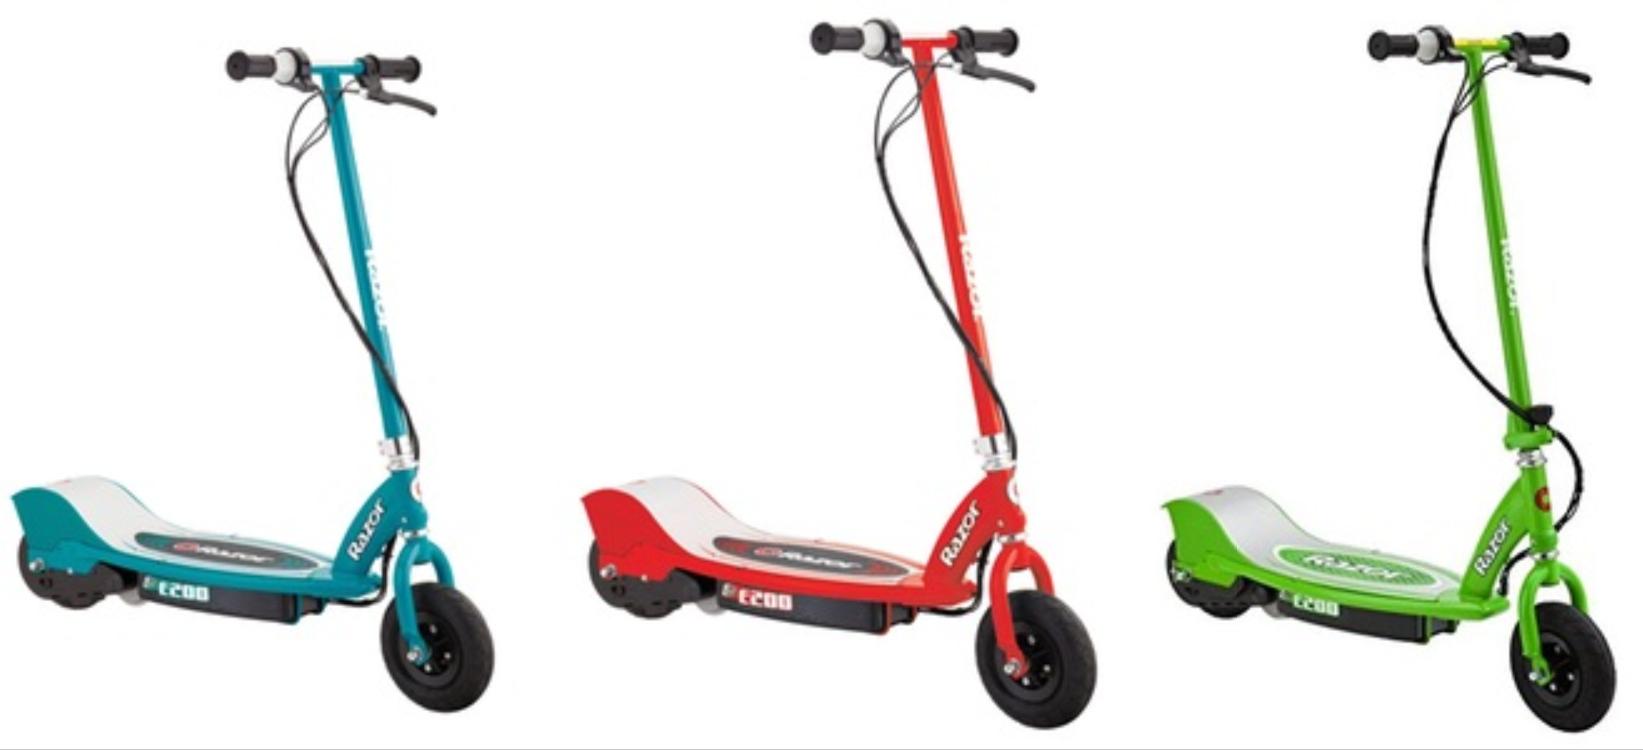 The E200 colour range offered by Razor.